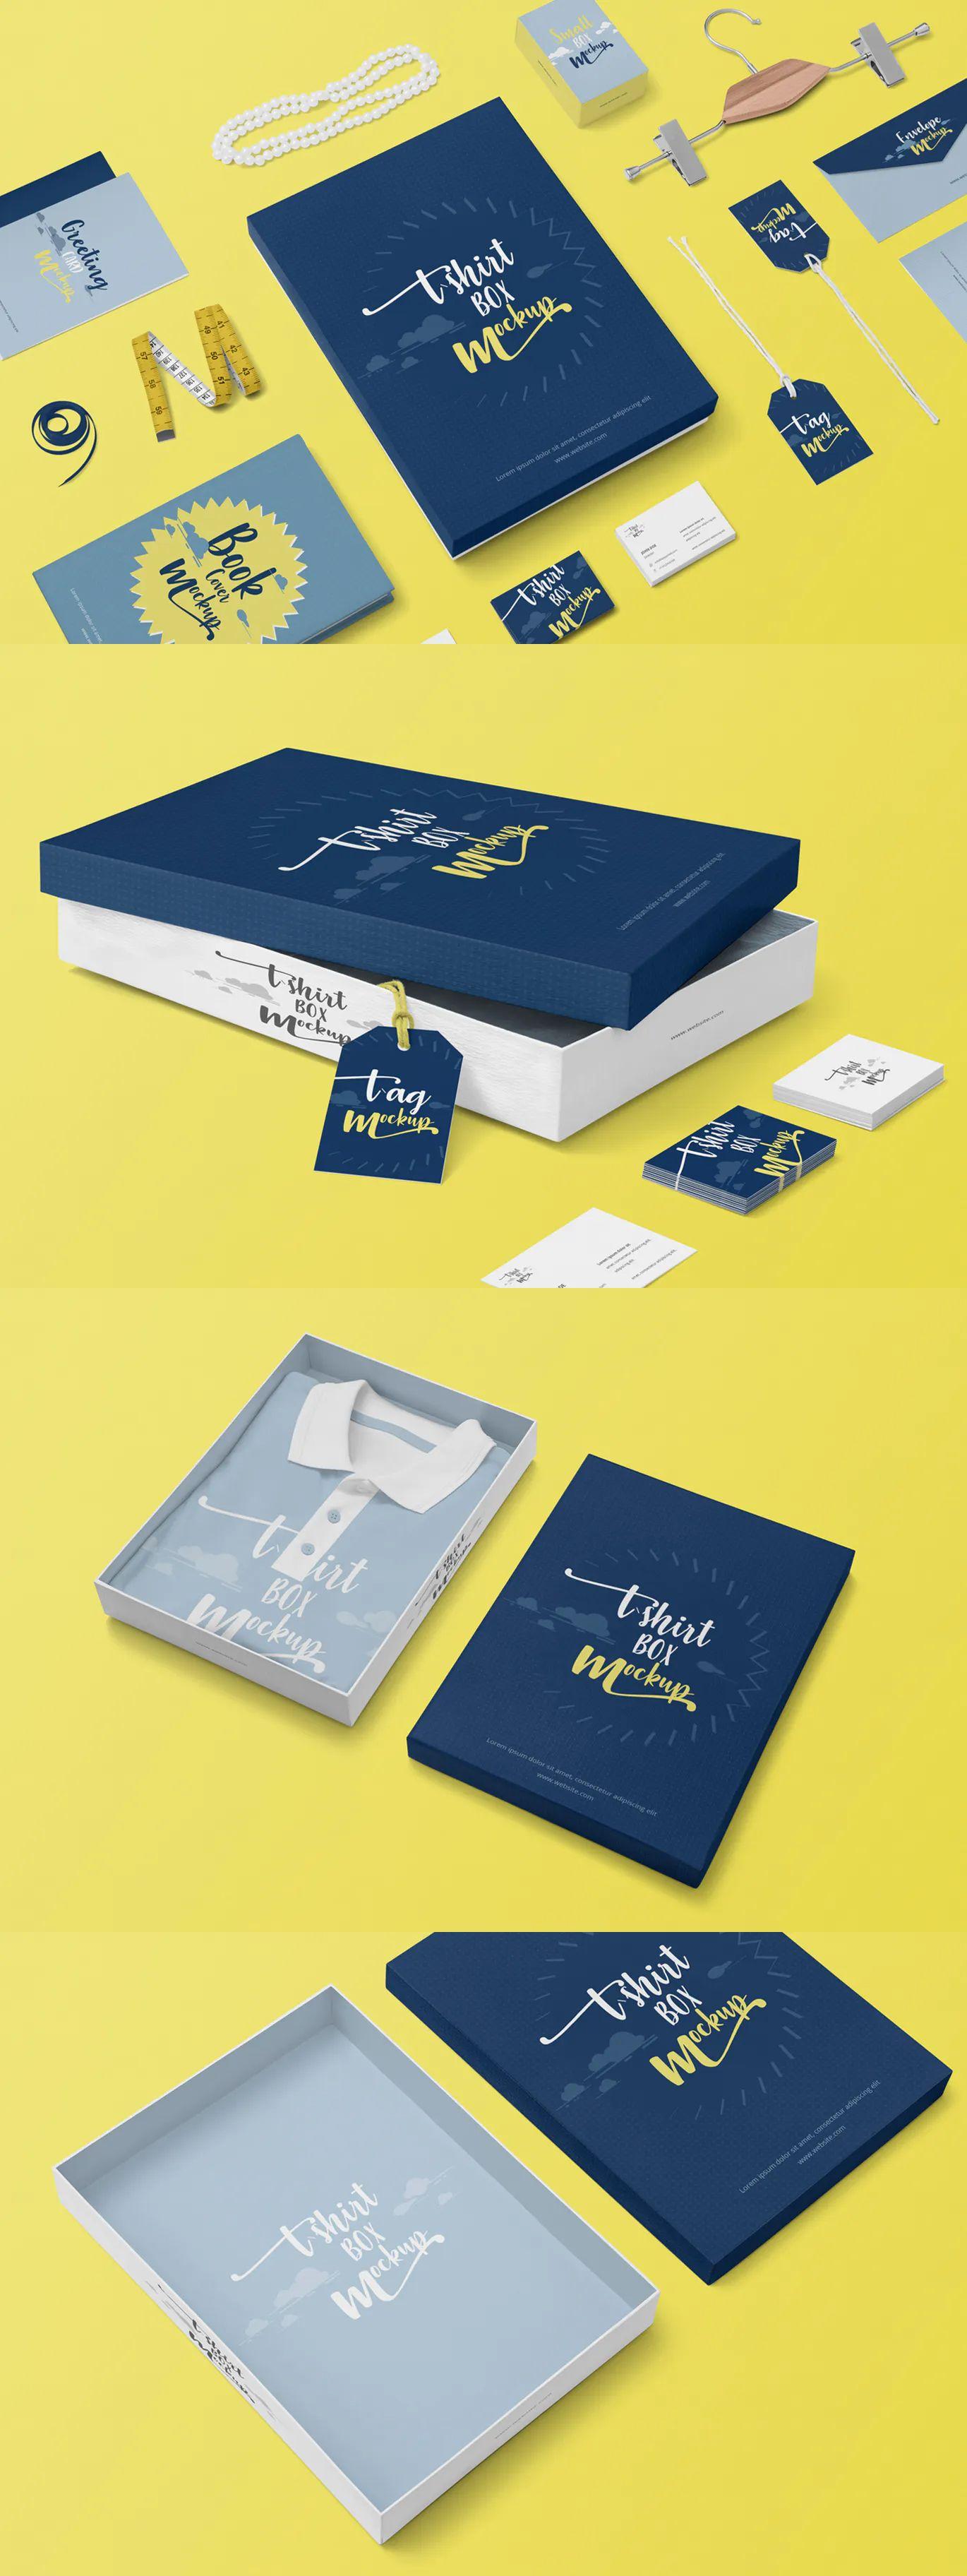 Download Tee Shirt Box Mockups By Zippypixels On Envato Elements Box Mockup Mockup Billboard Mockup